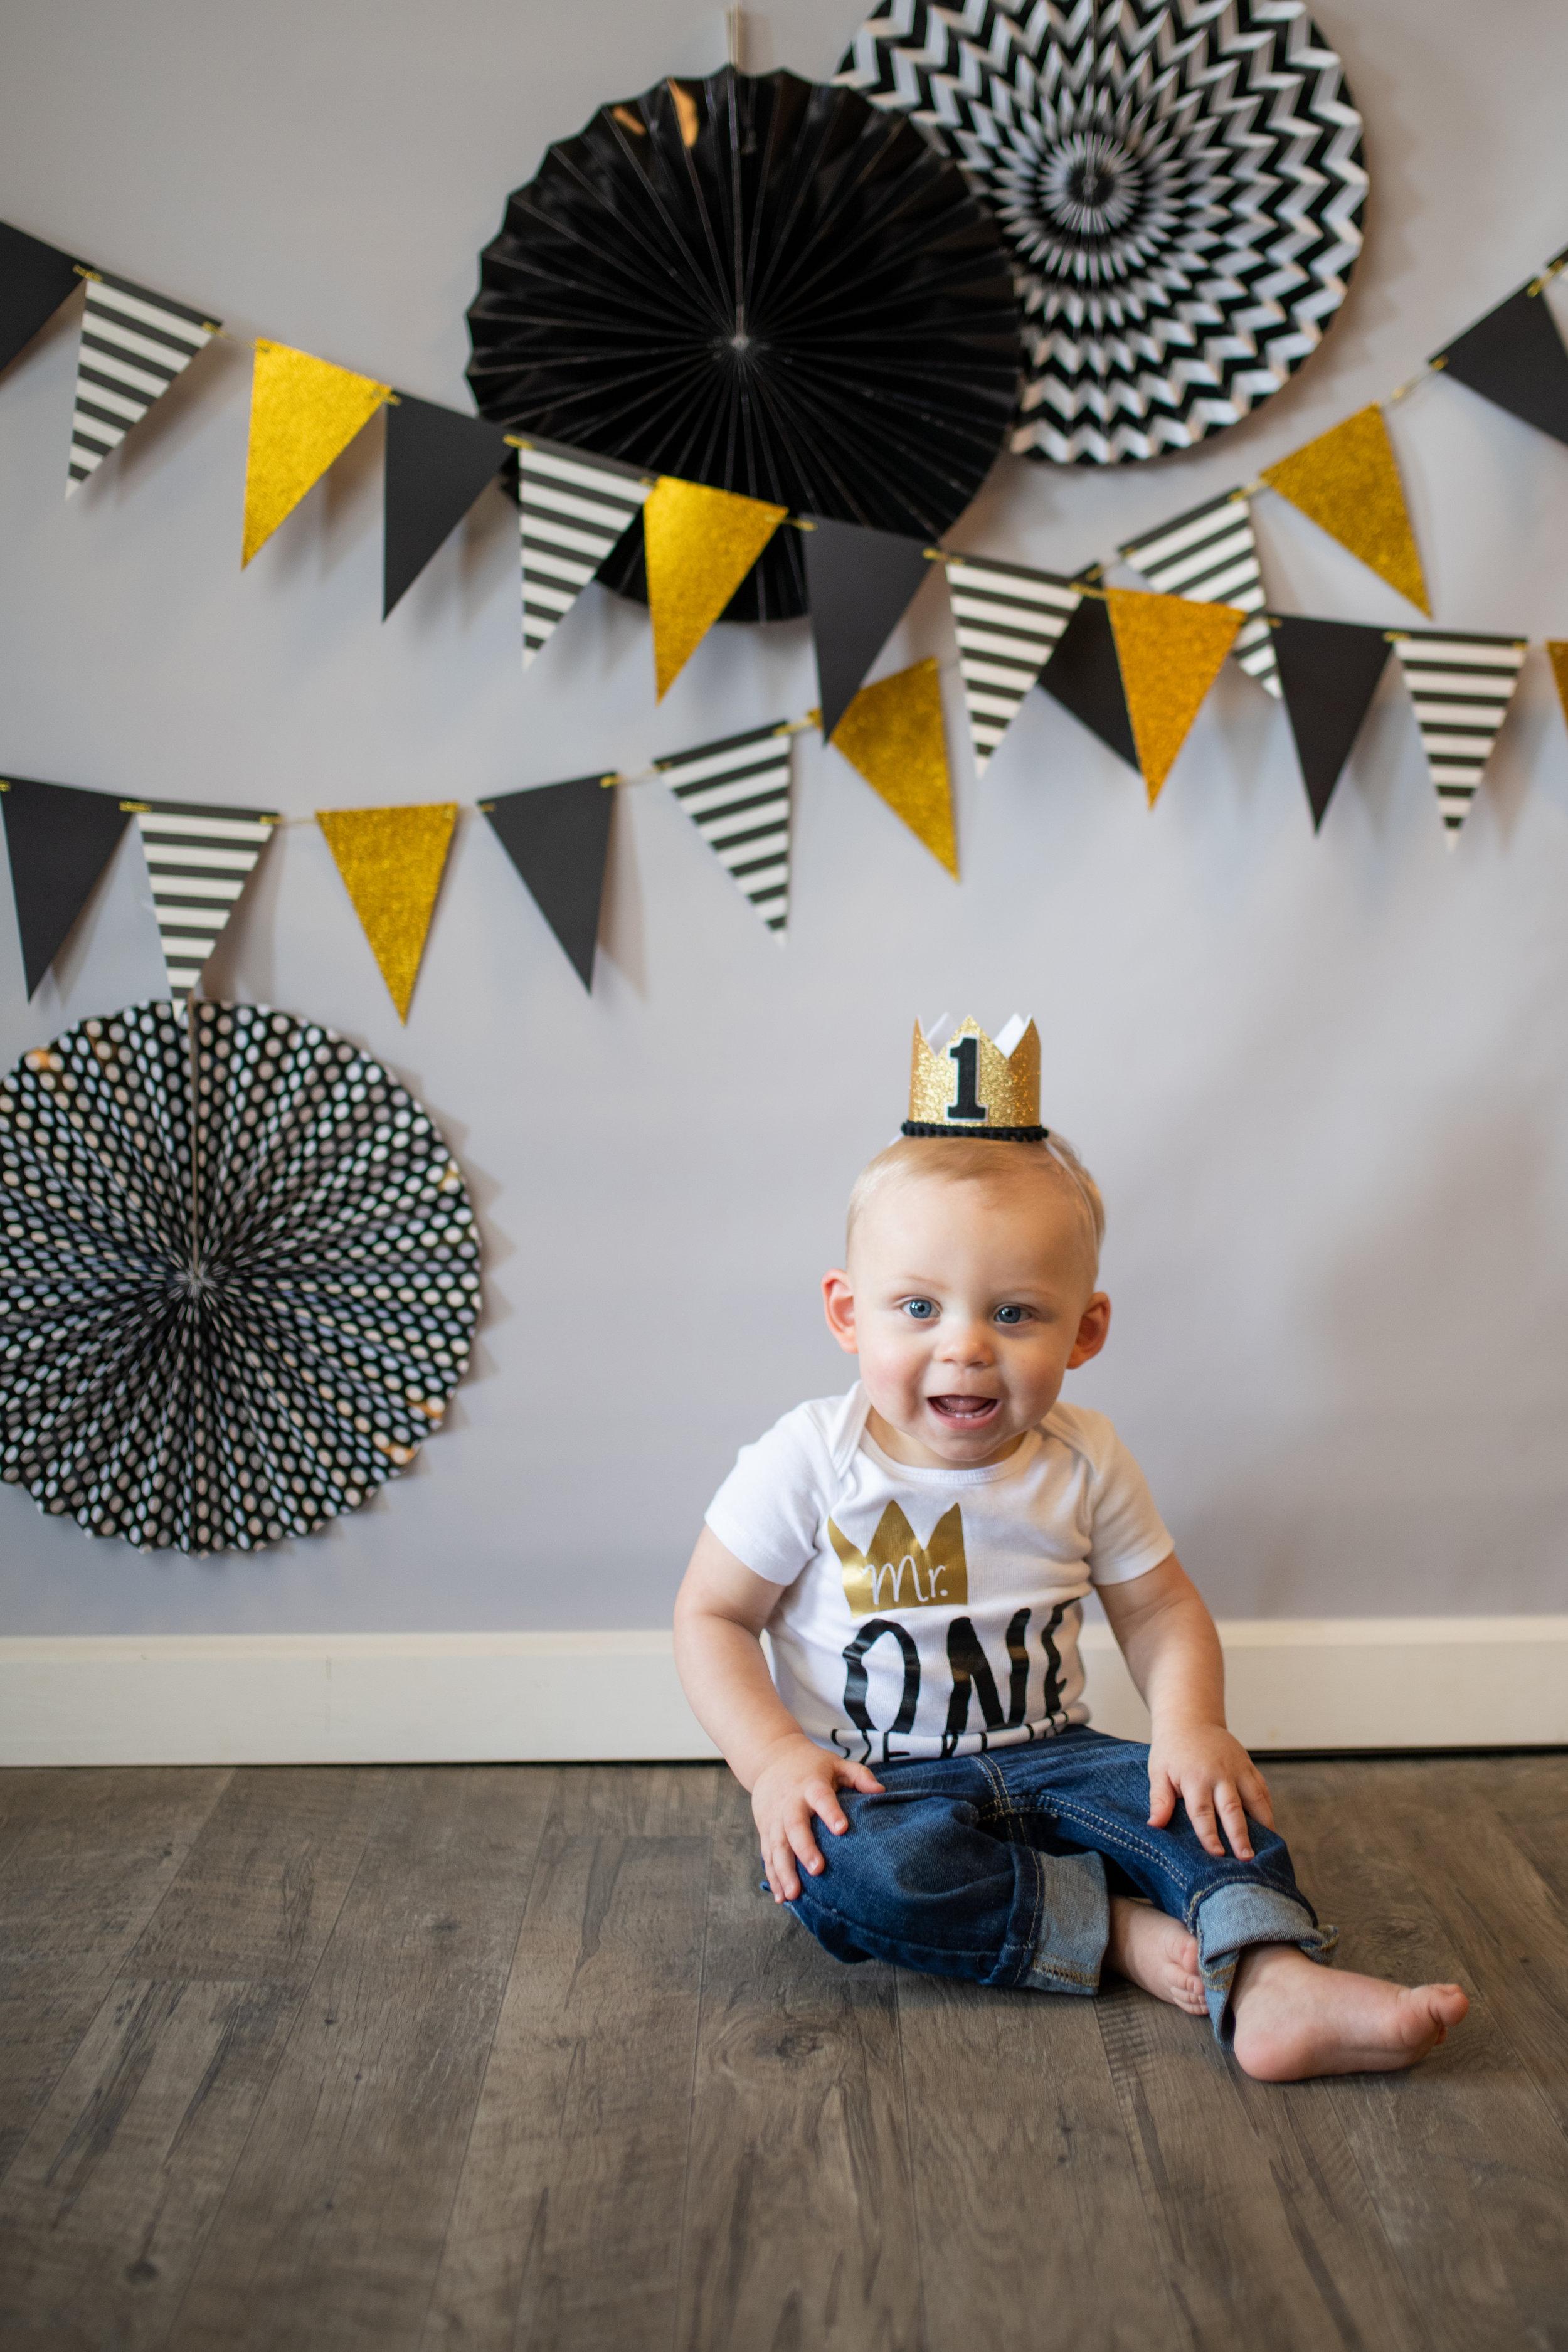 Chattanooga-Baby-Photographer-4.jpg